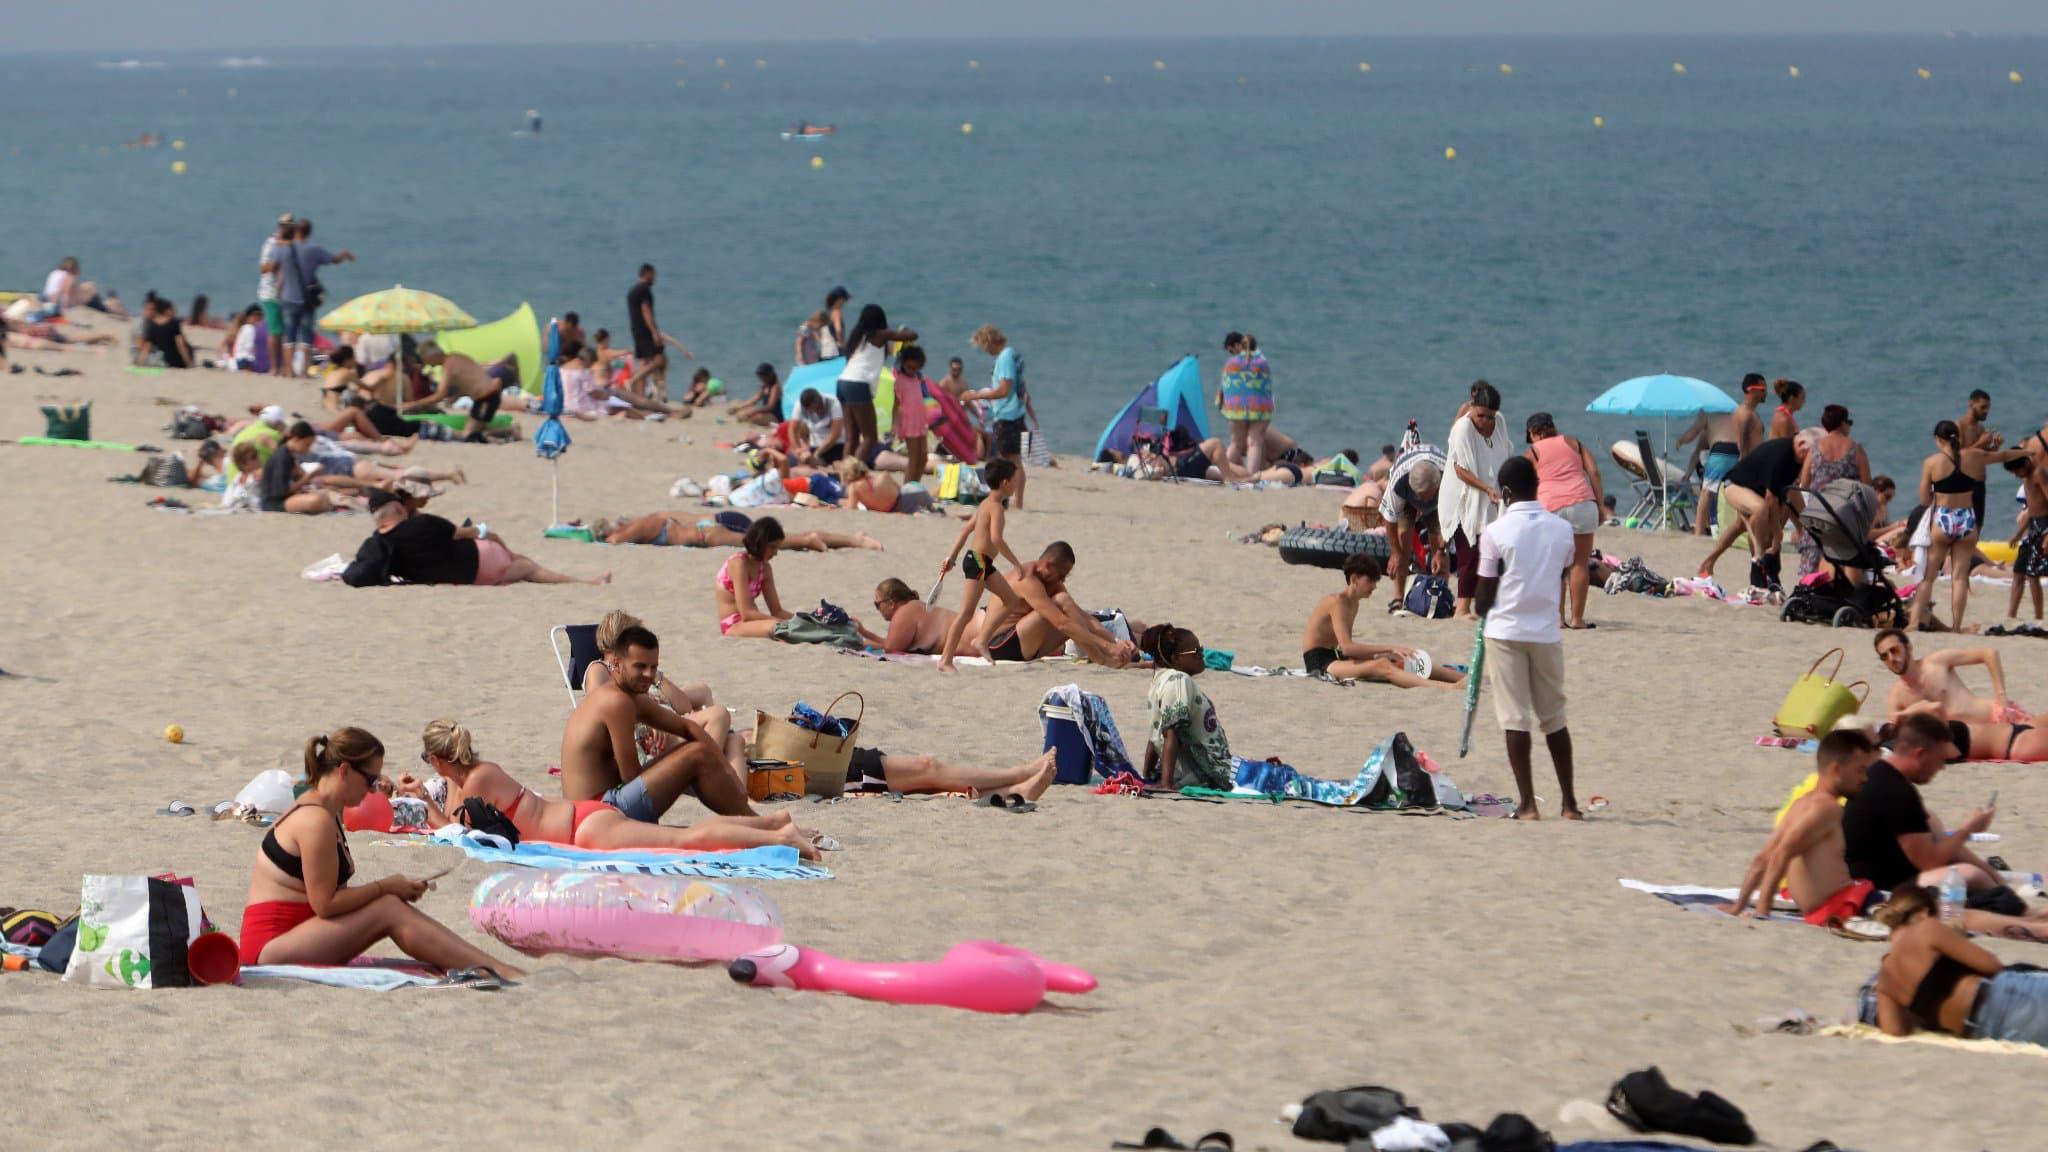 Femme arabe topless à la plage